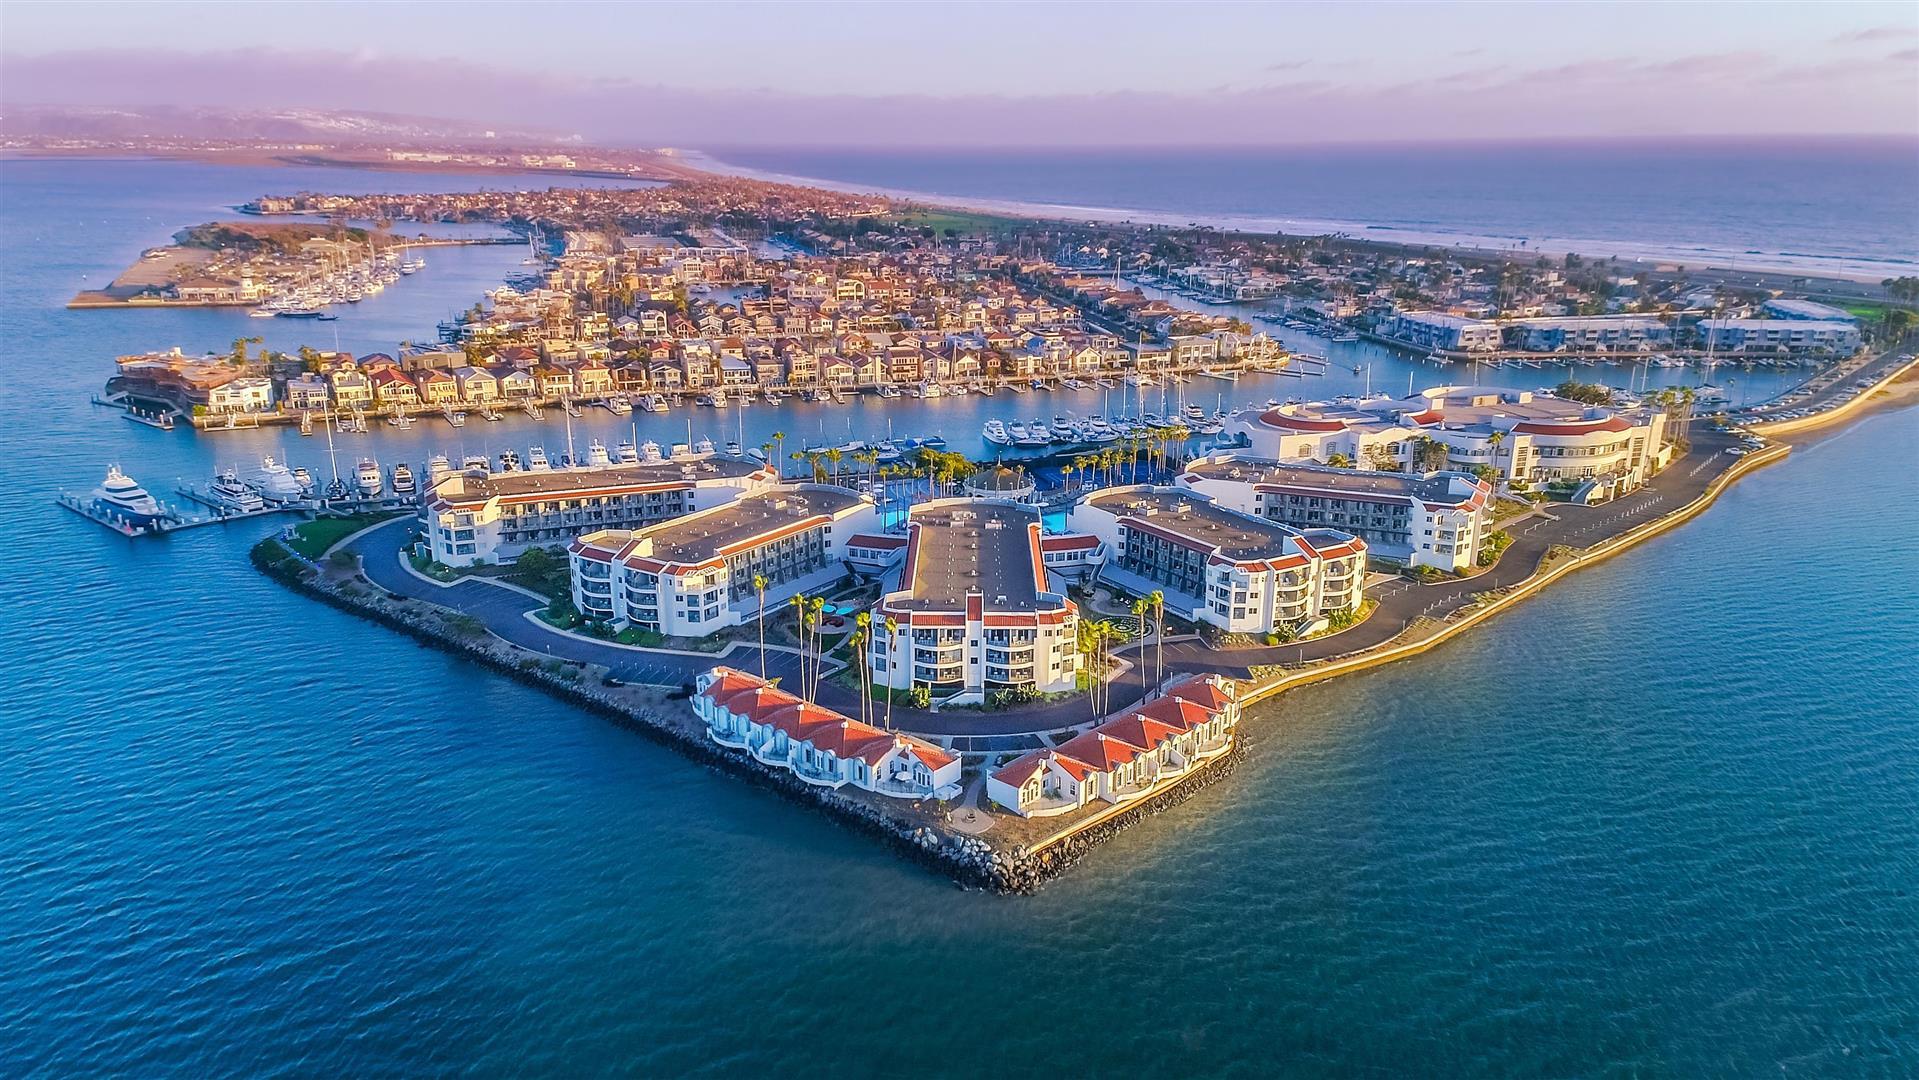 Meetings And Events At Loews Coronado Bay San Diego Coronado Ca Us